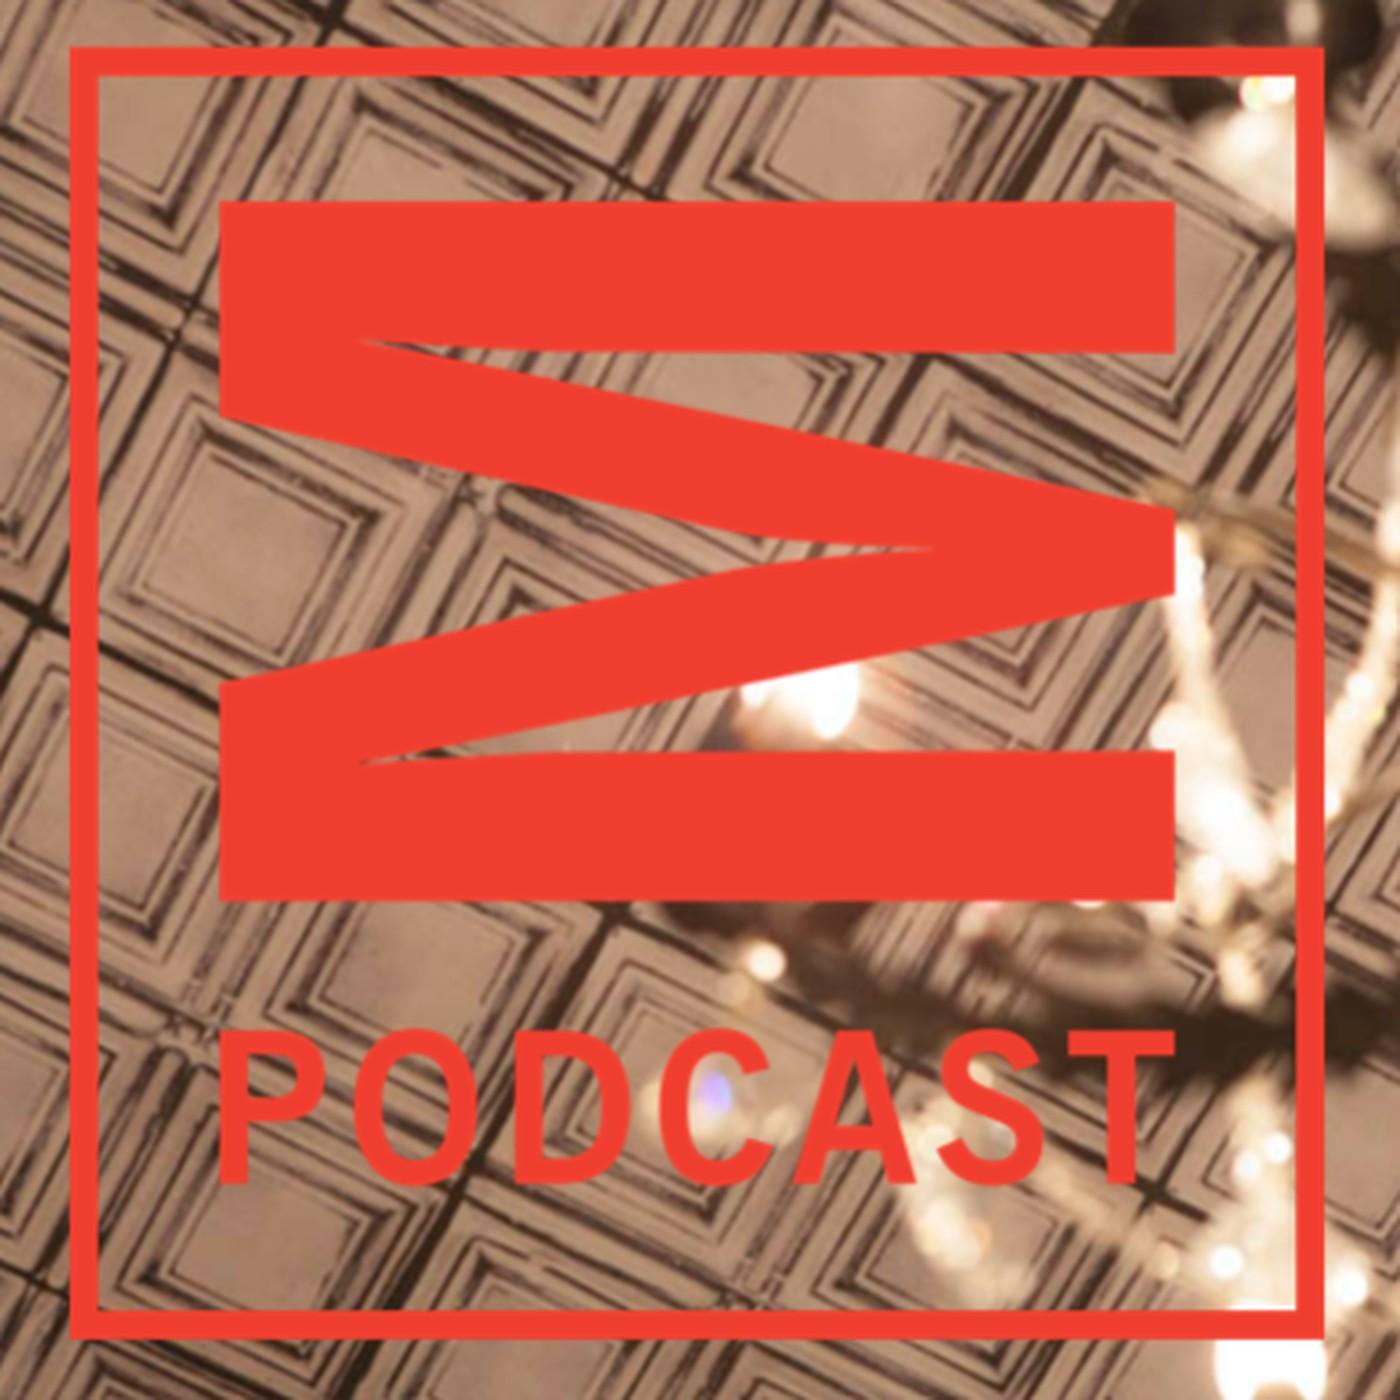 Episode 36: Deborah Koenigsberger, Noir et Blanc NYC and Hearts of Gold